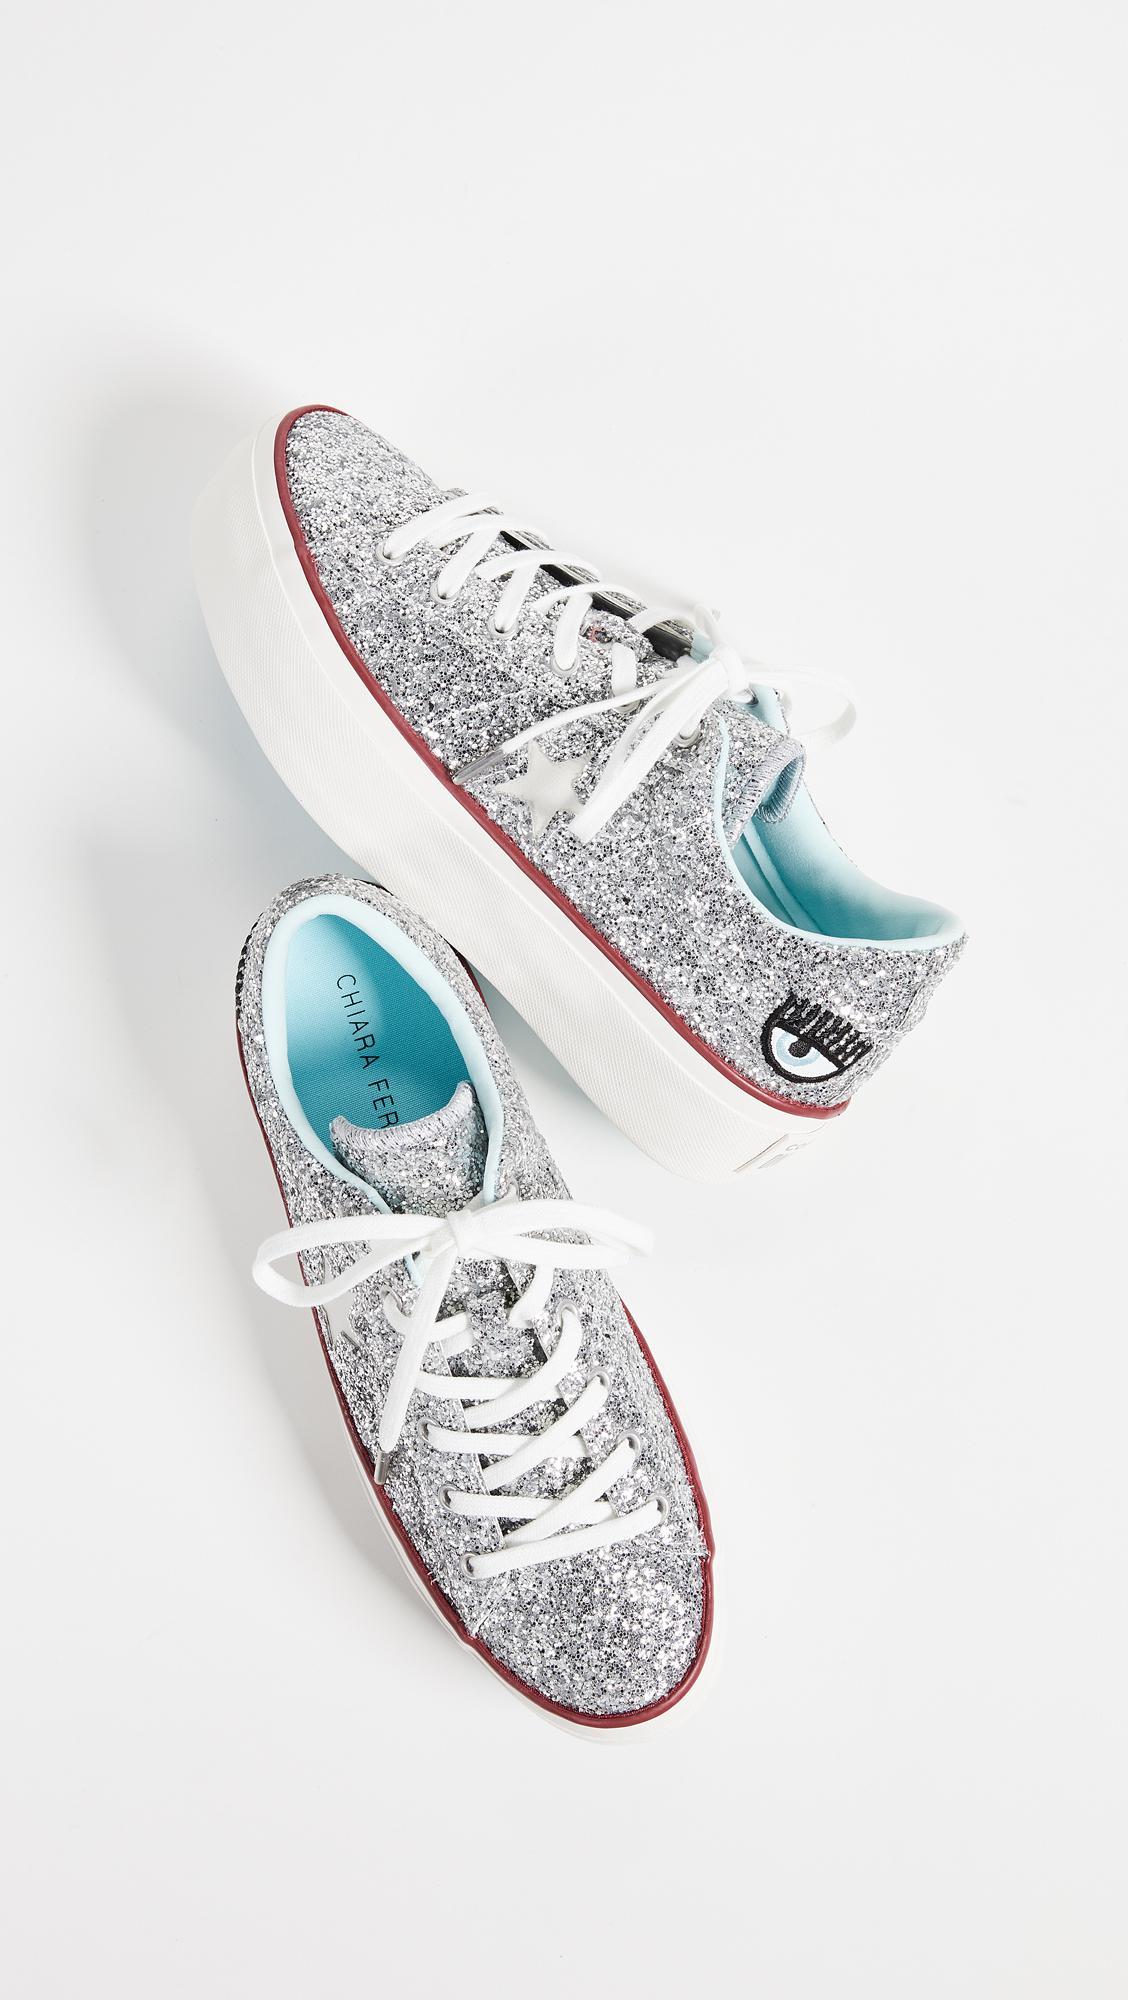 2chiara ferragni converse scarpe